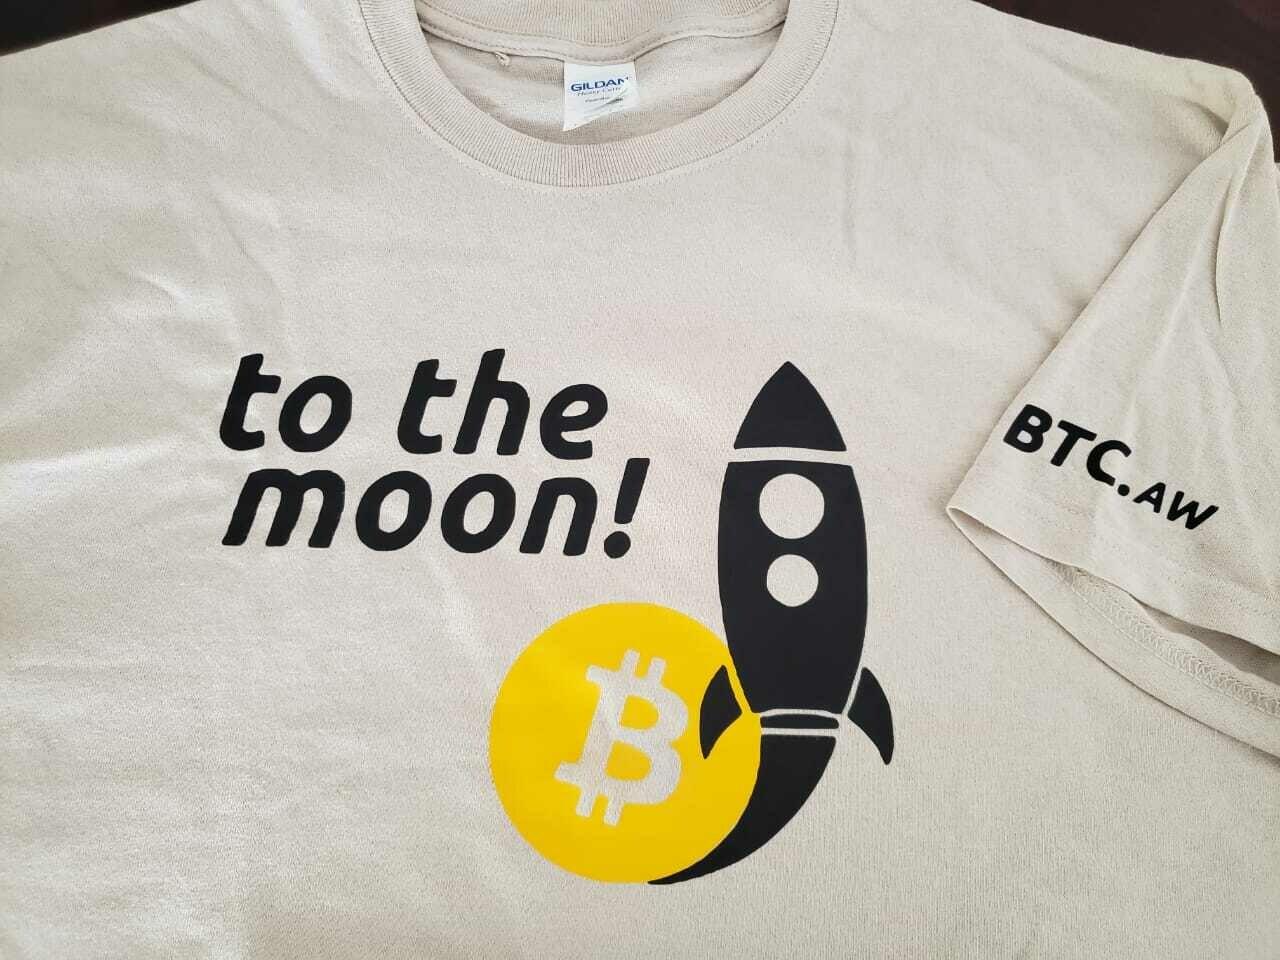 to the moon! - Bitcoin Shirt